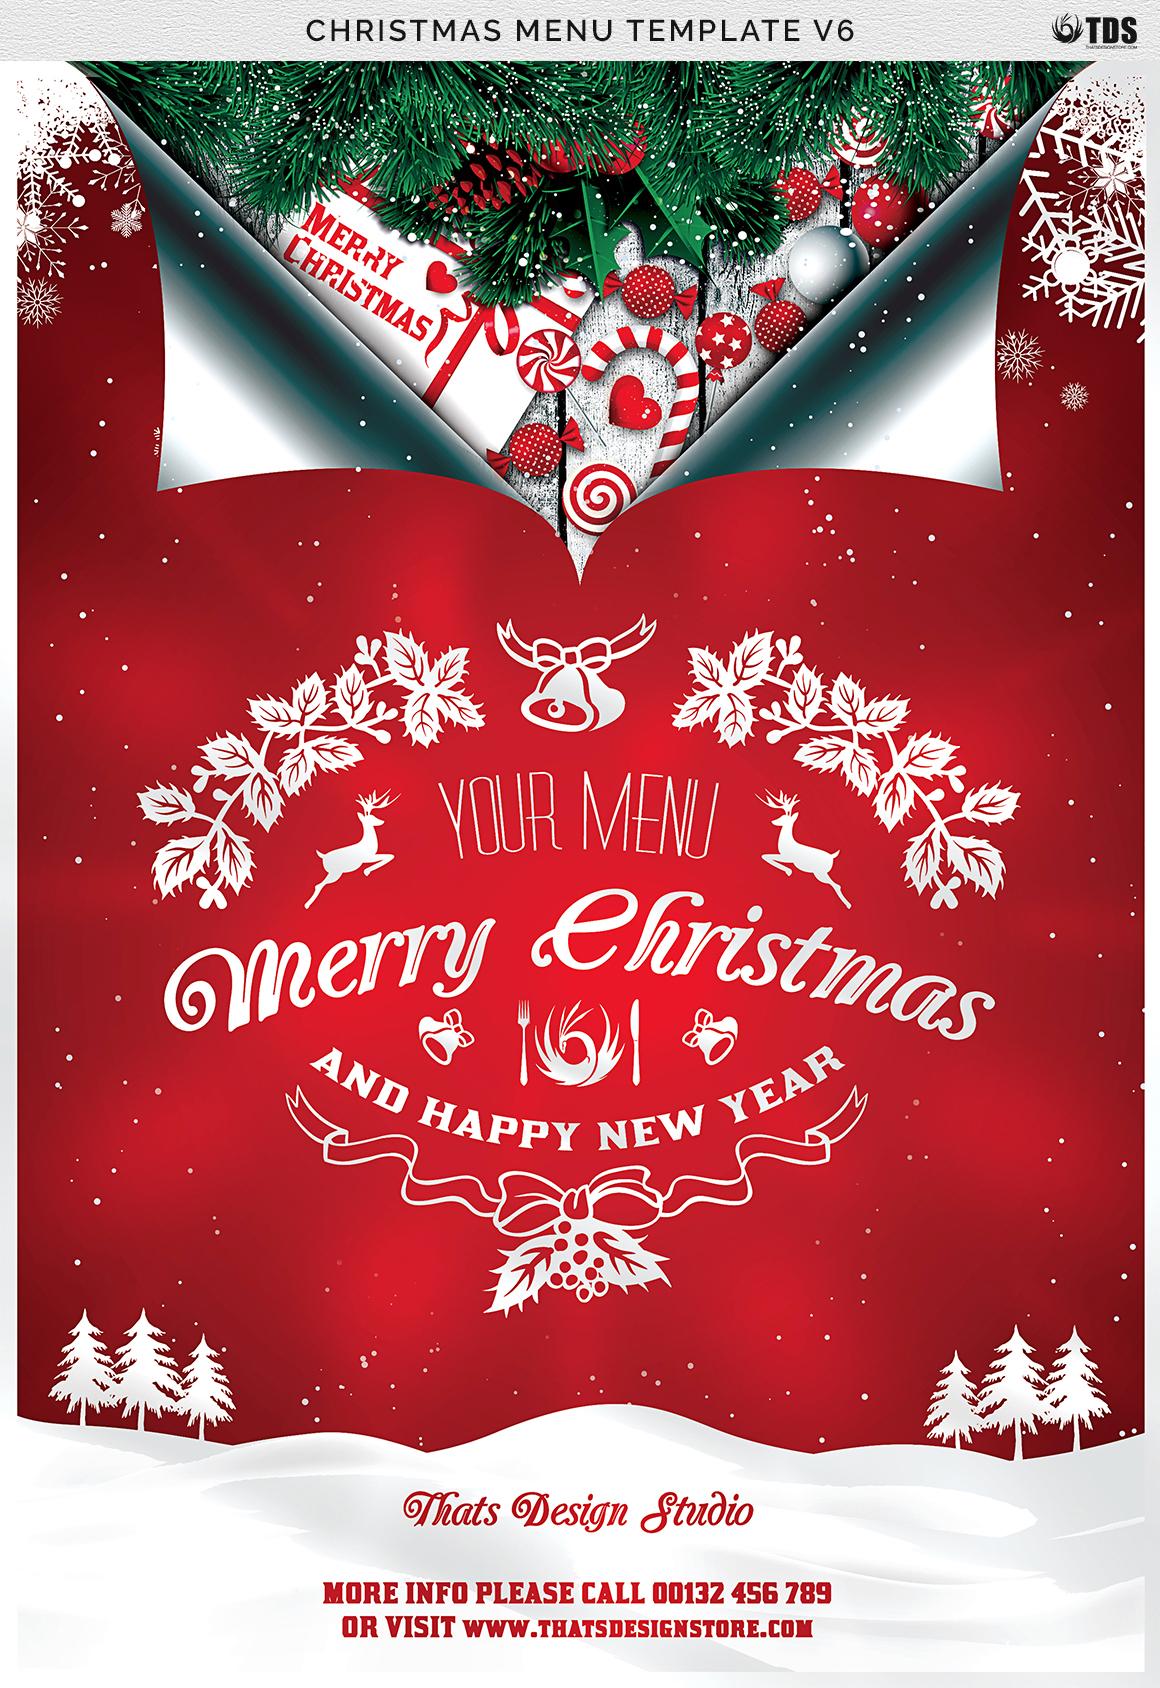 christmas menu template v6 example image 9 - Christmas Menu Template